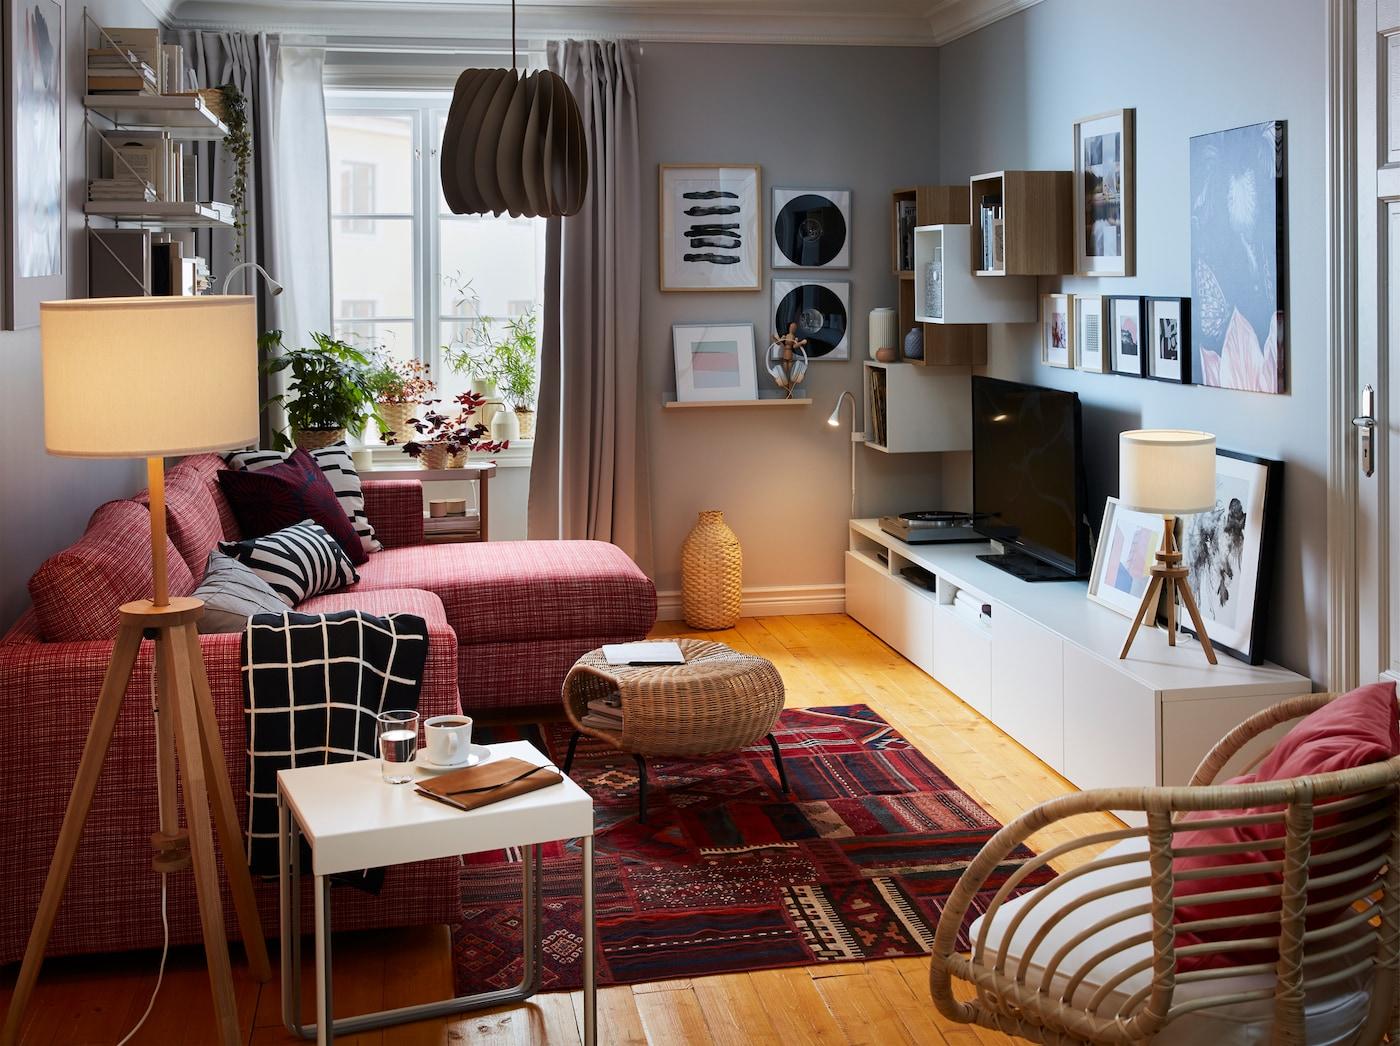 Det aller nødvendigste i ei fleksibel stue